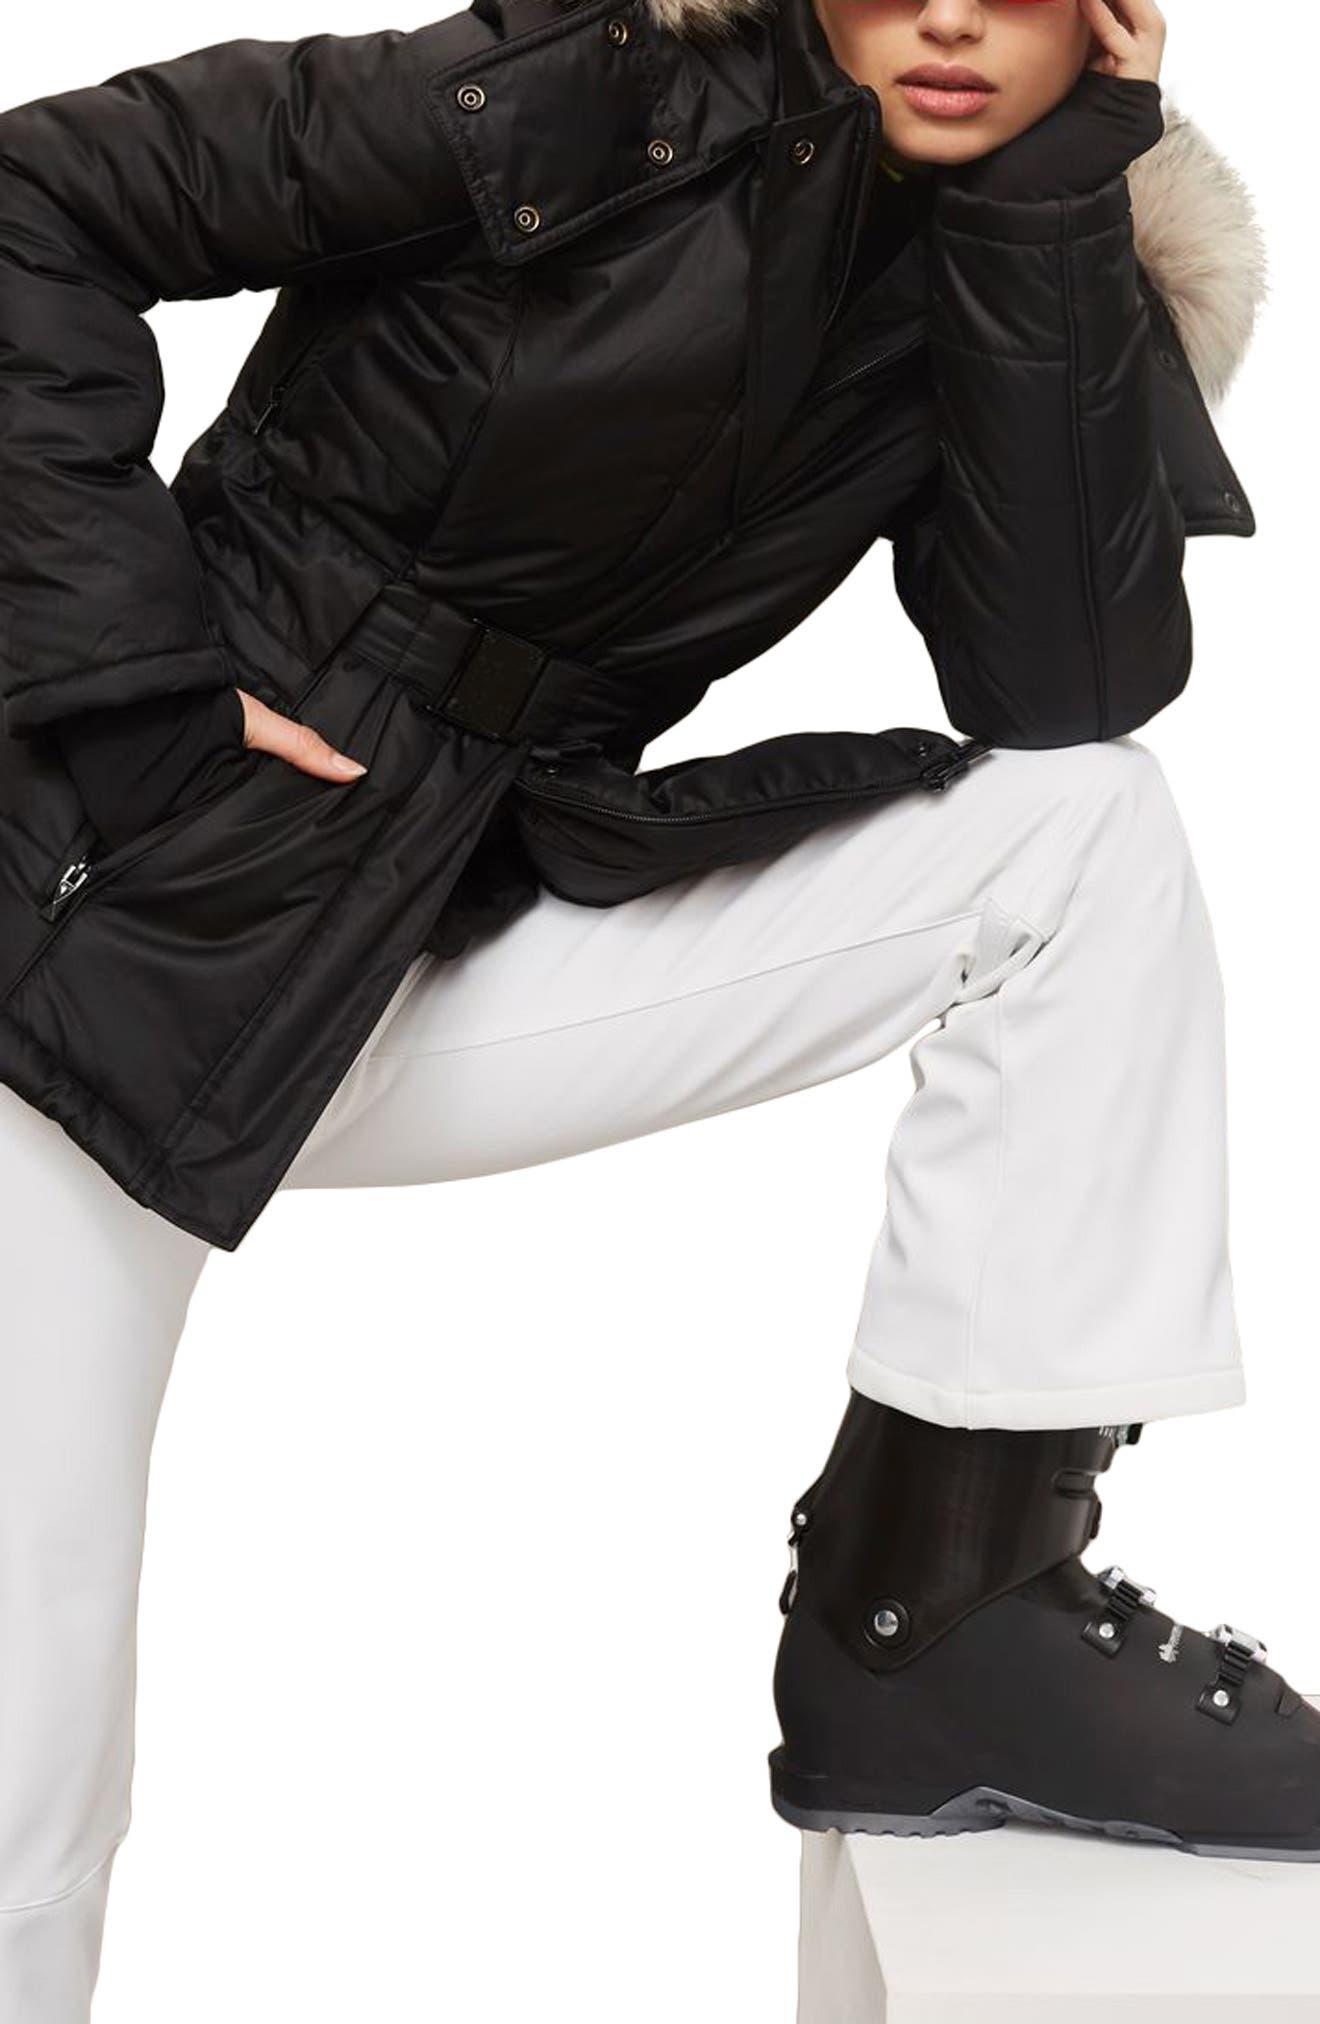 SNO Amazon Puffer Jacket,                             Alternate thumbnail 4, color,                             001